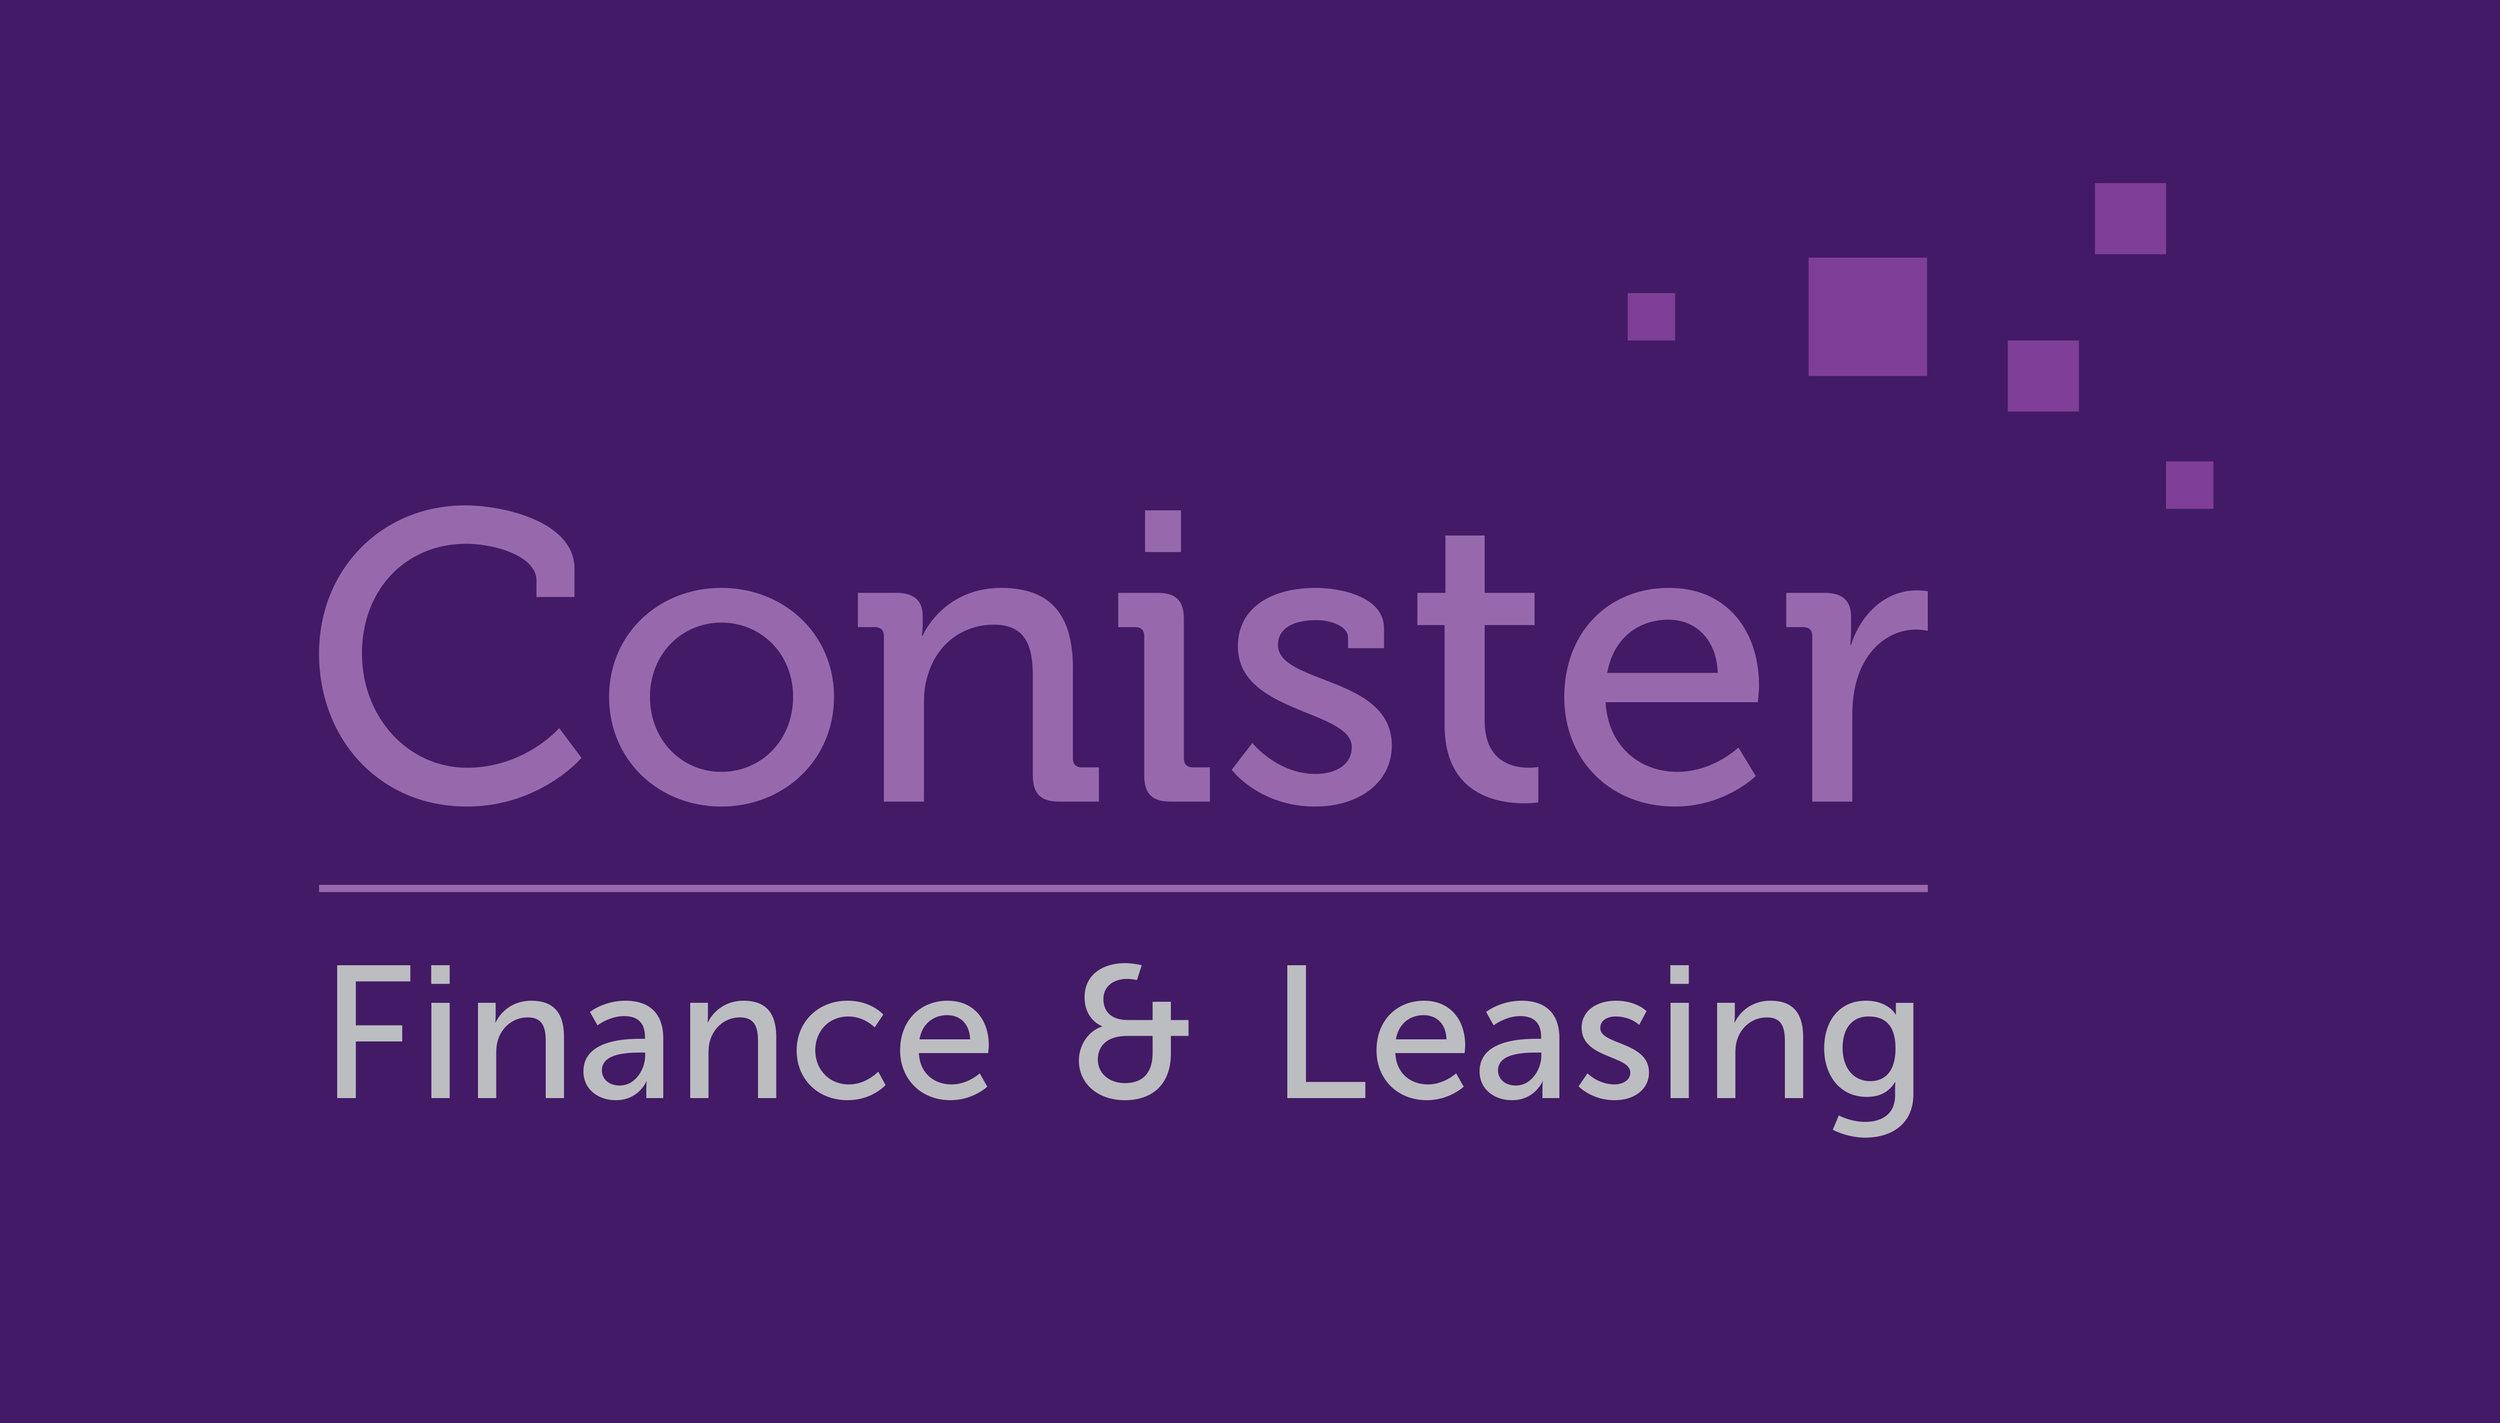 ConisterBank_FinanceLeasing_purple.jpg